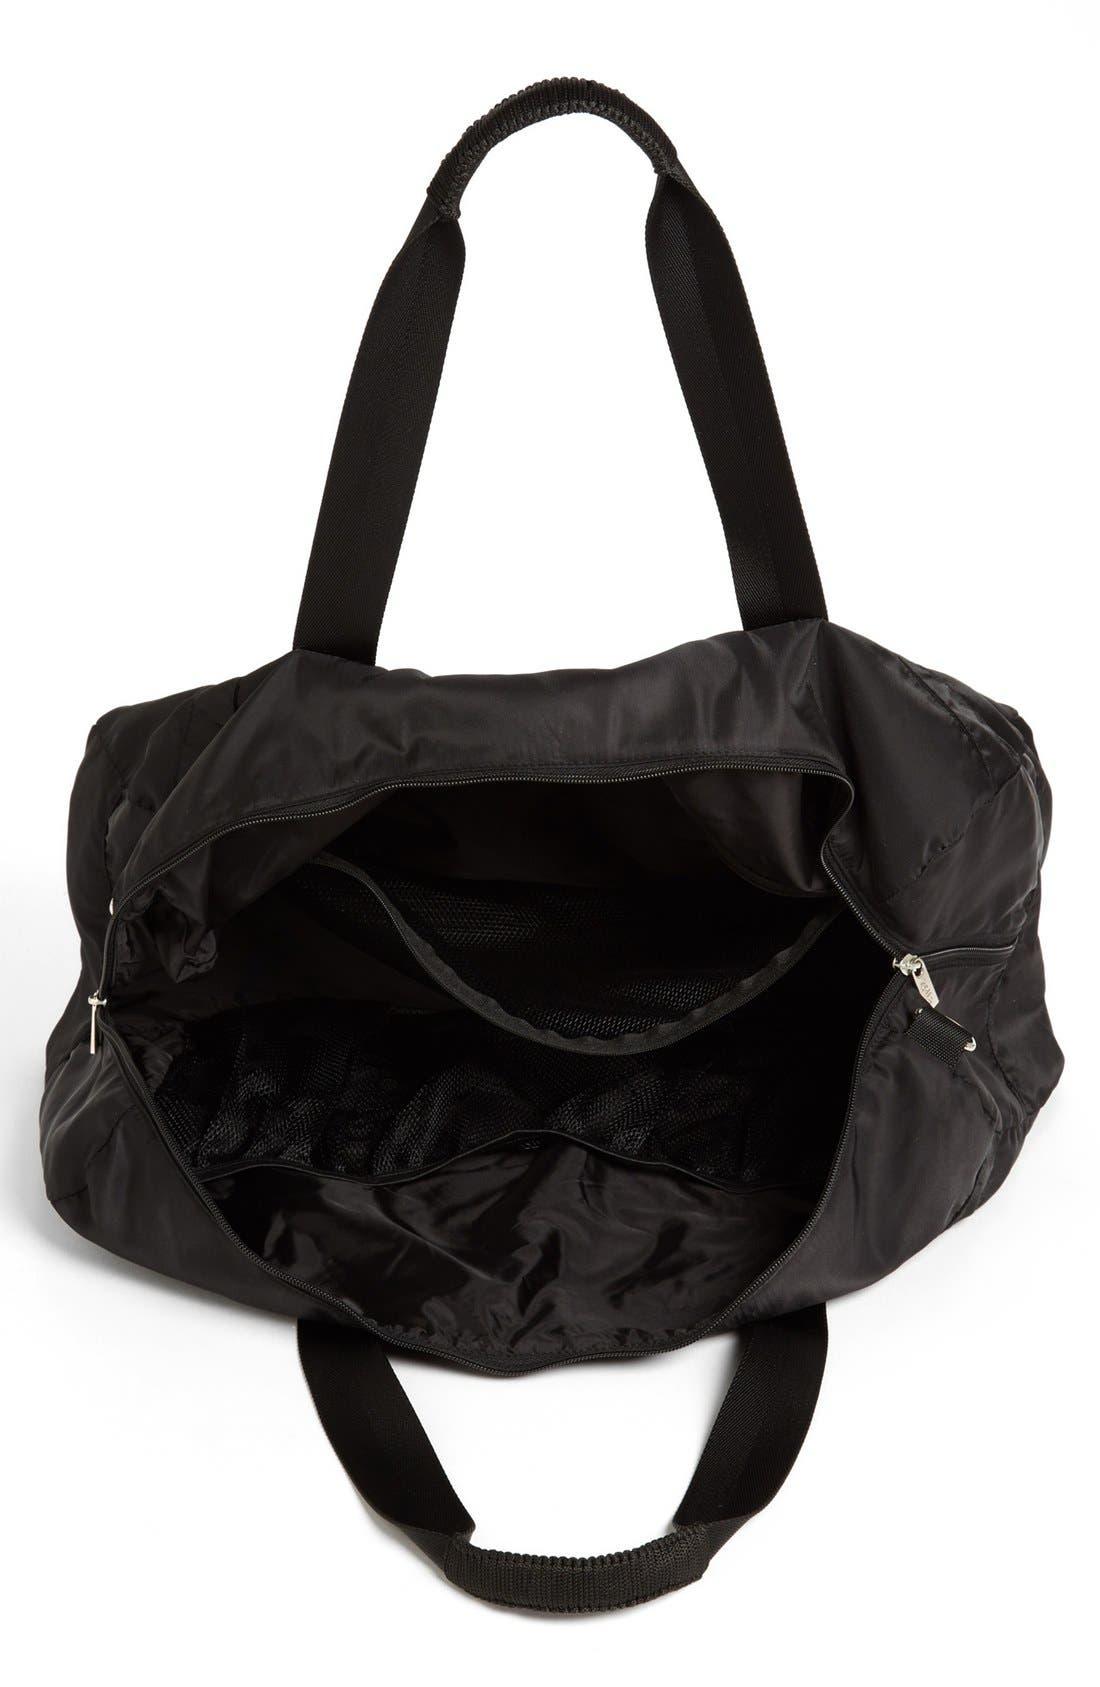 Alternate Image 3  - Zella Quilted Gear Duffel Bag